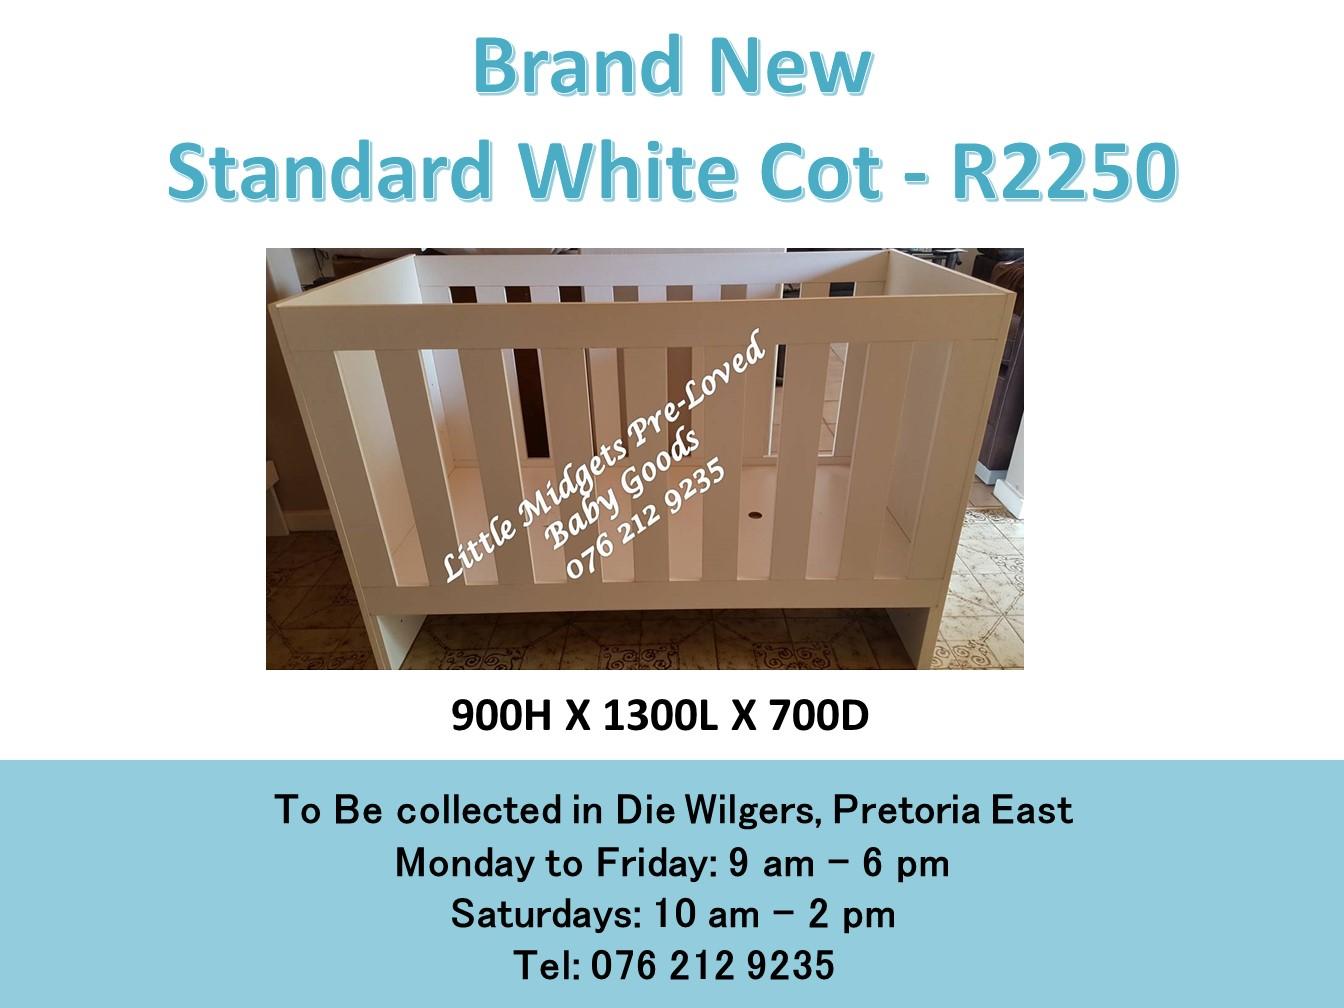 Brand New Standard White Cot (900H X 1300L X 700D)